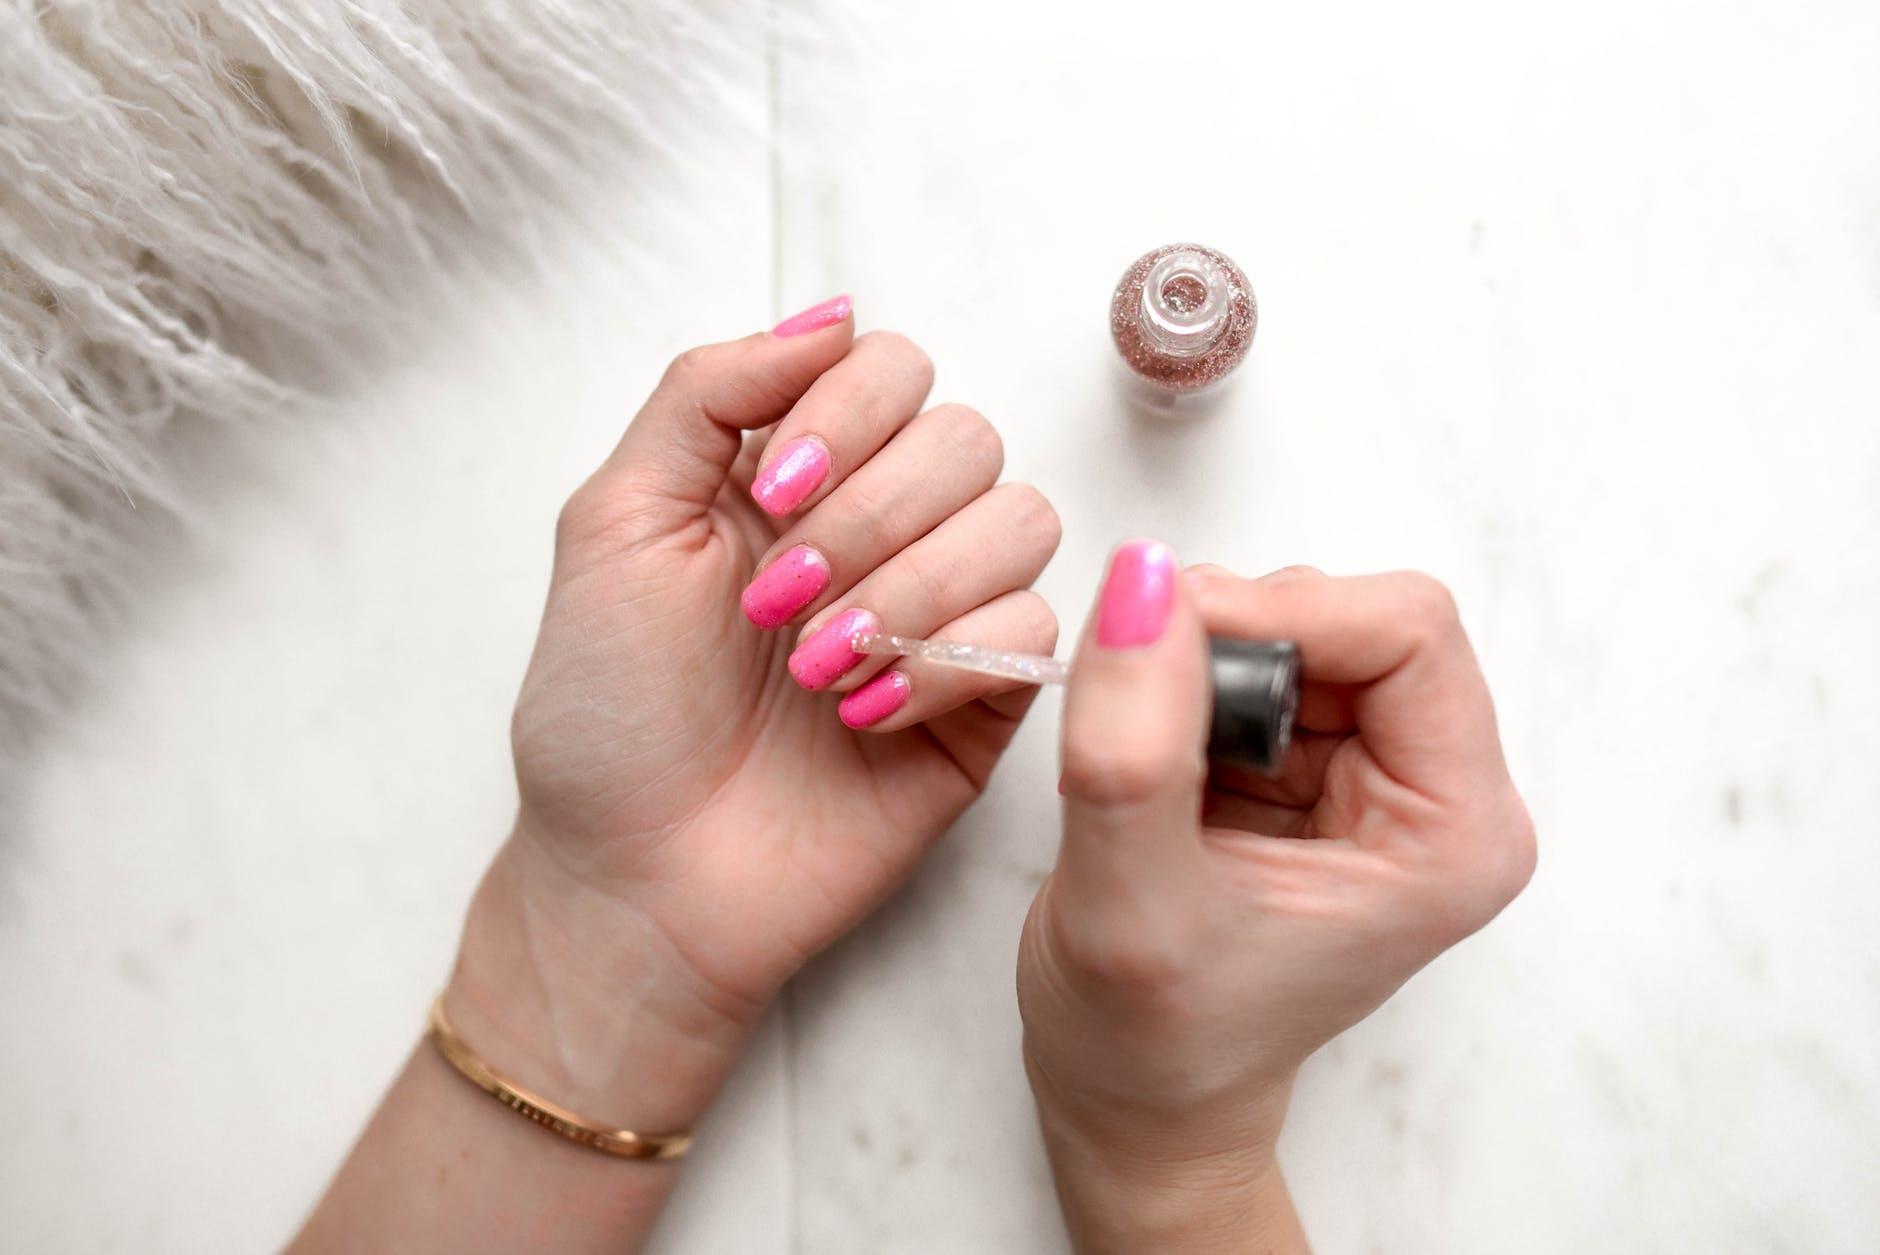 nagels roze lakken met kwastje